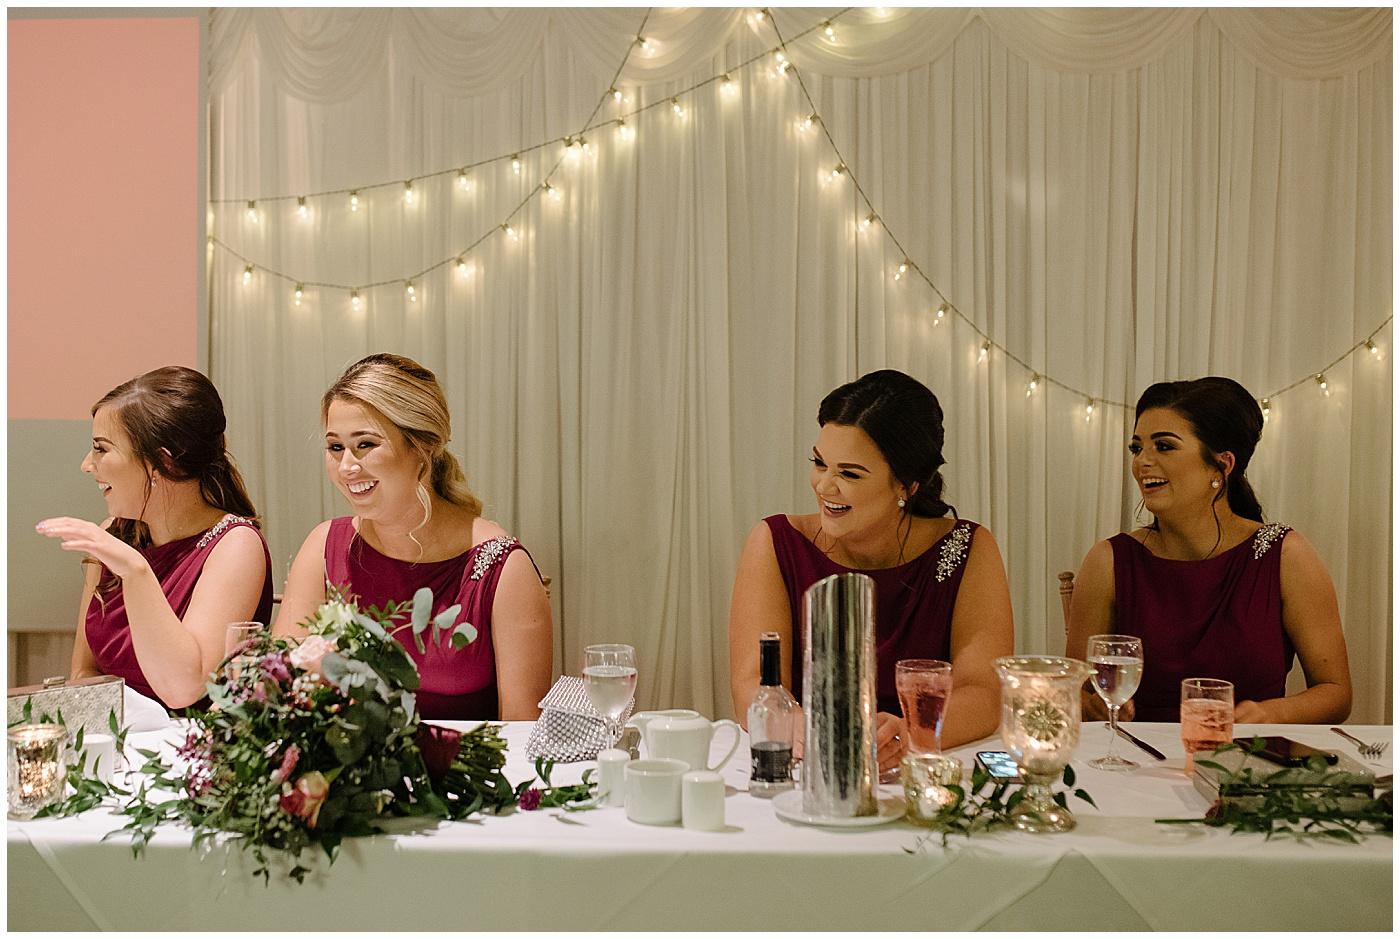 lissan-house-wedding-jude-browne-photography_0120.jpg